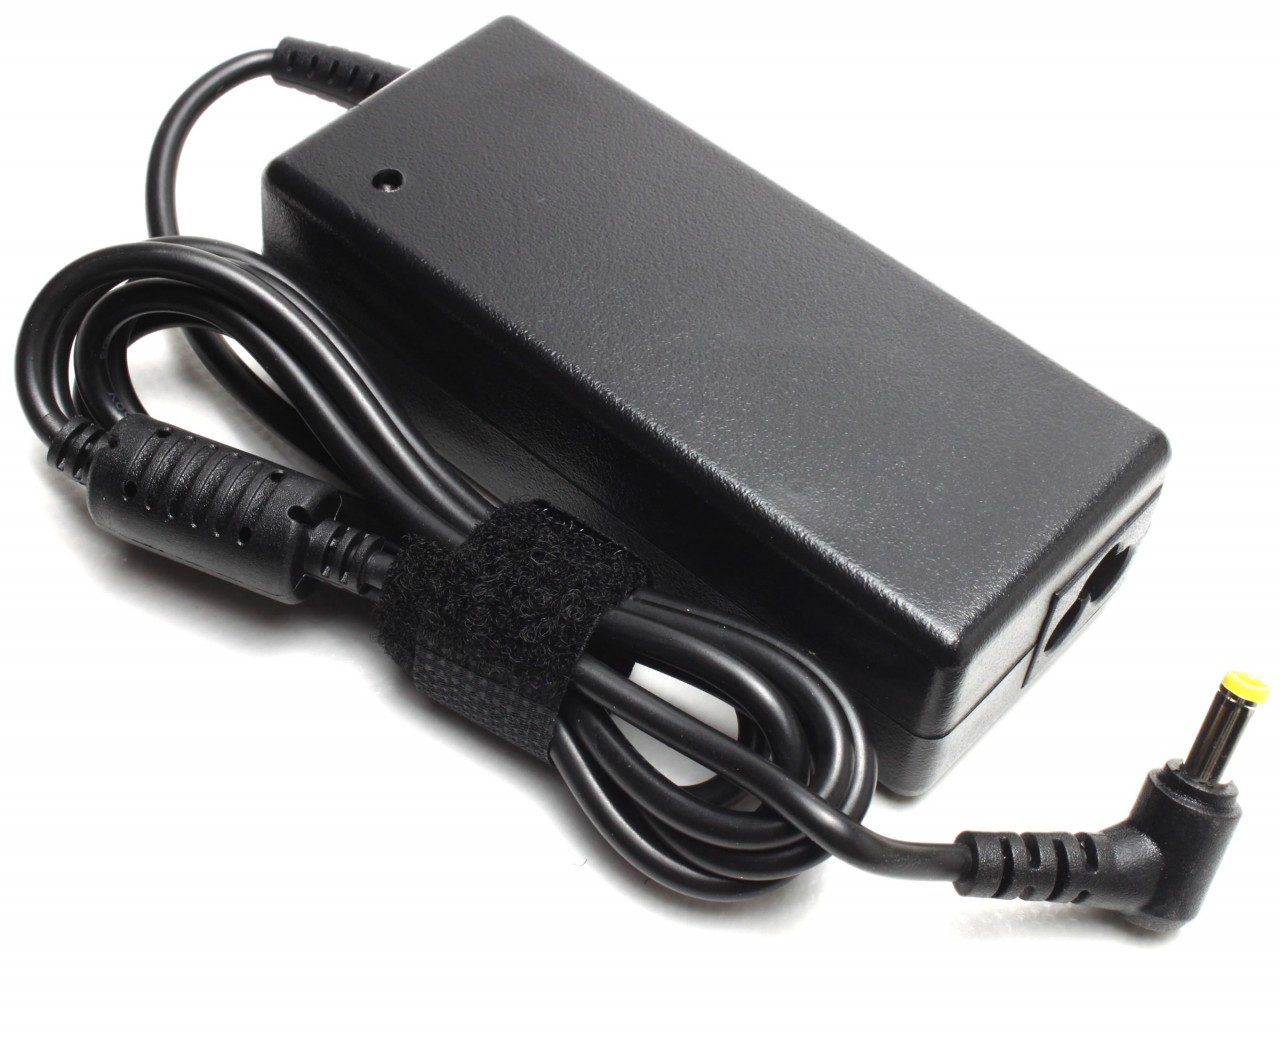 Incarcator Toshiba Libretto W105 65W Replacement imagine powerlaptop.ro 2021